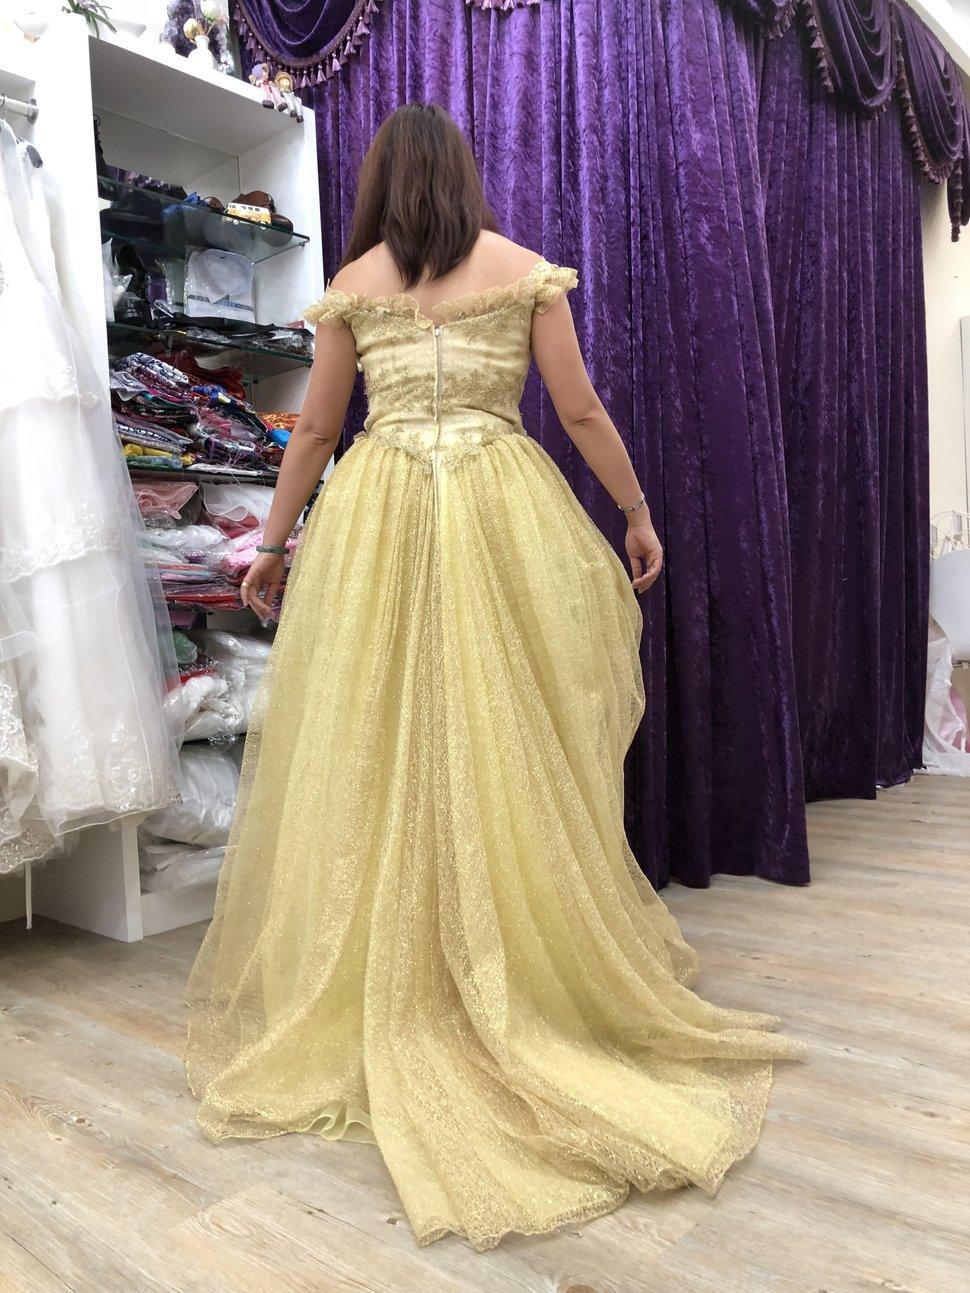 IMG_5947 - 全台最便宜-45DESIGN四五婚紗禮服《結婚吧》